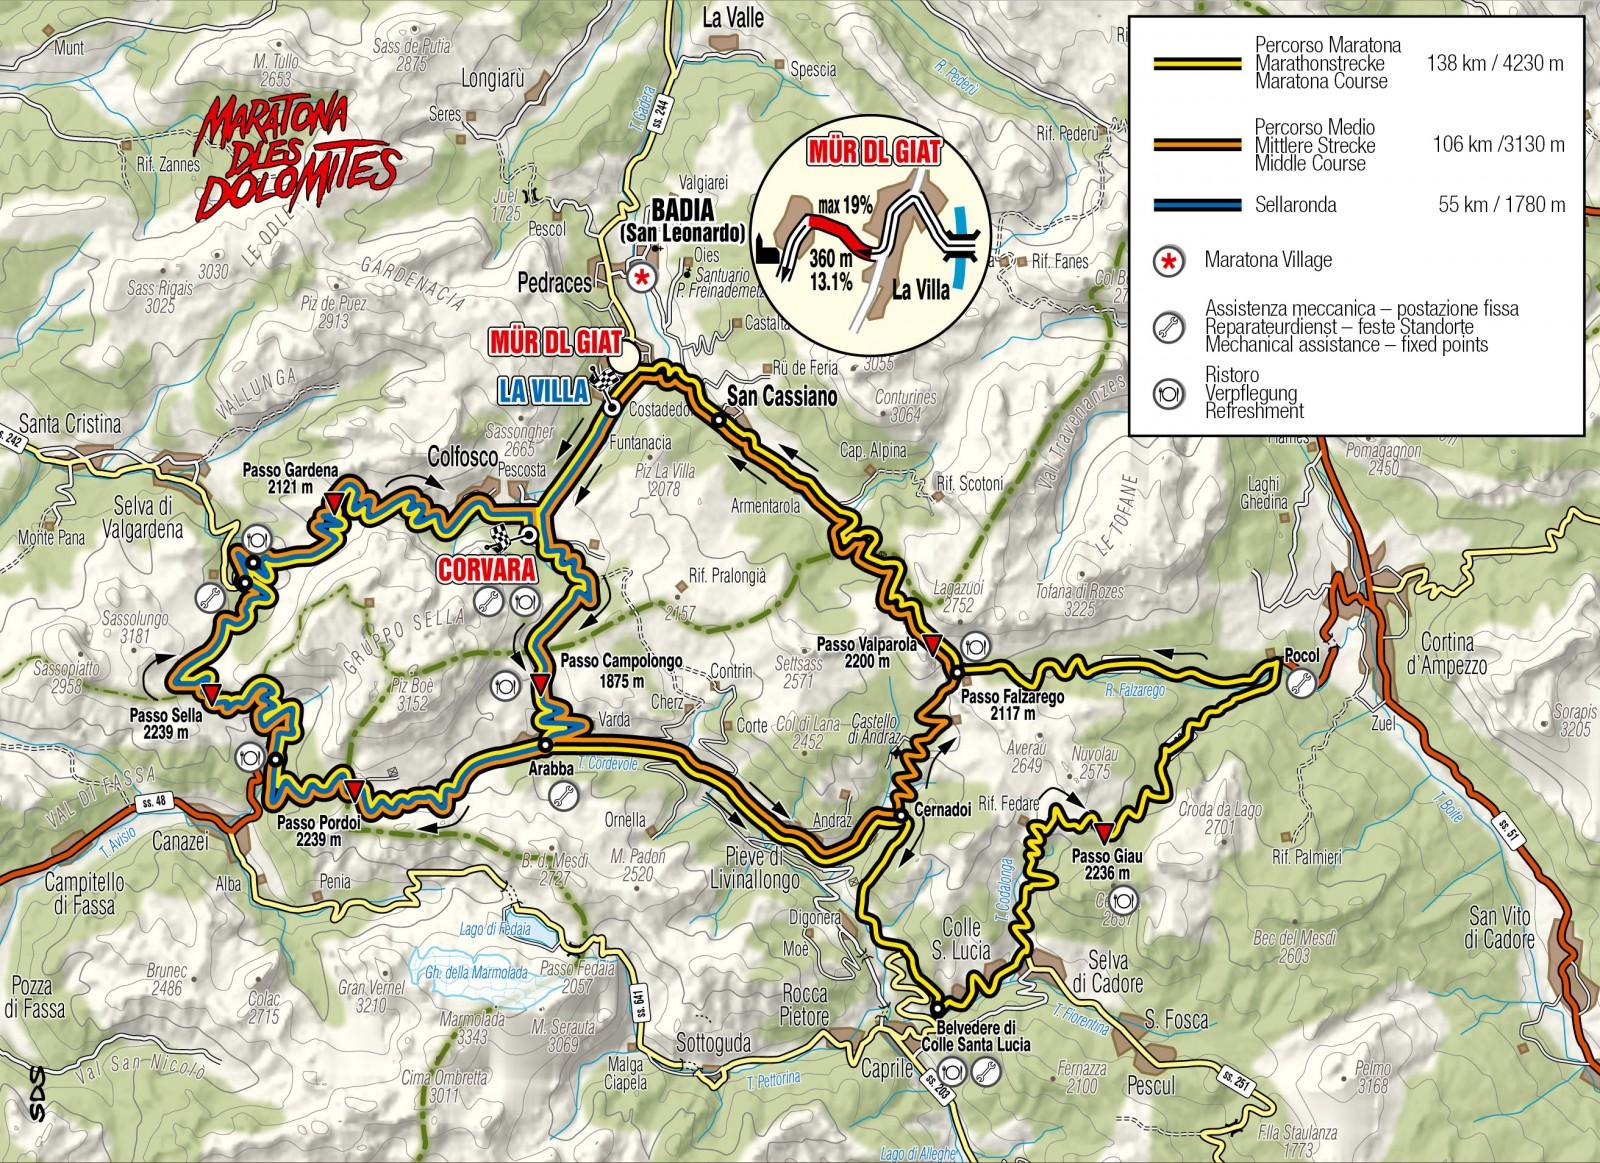 Maratona dles Dolomites  Strecke 2014